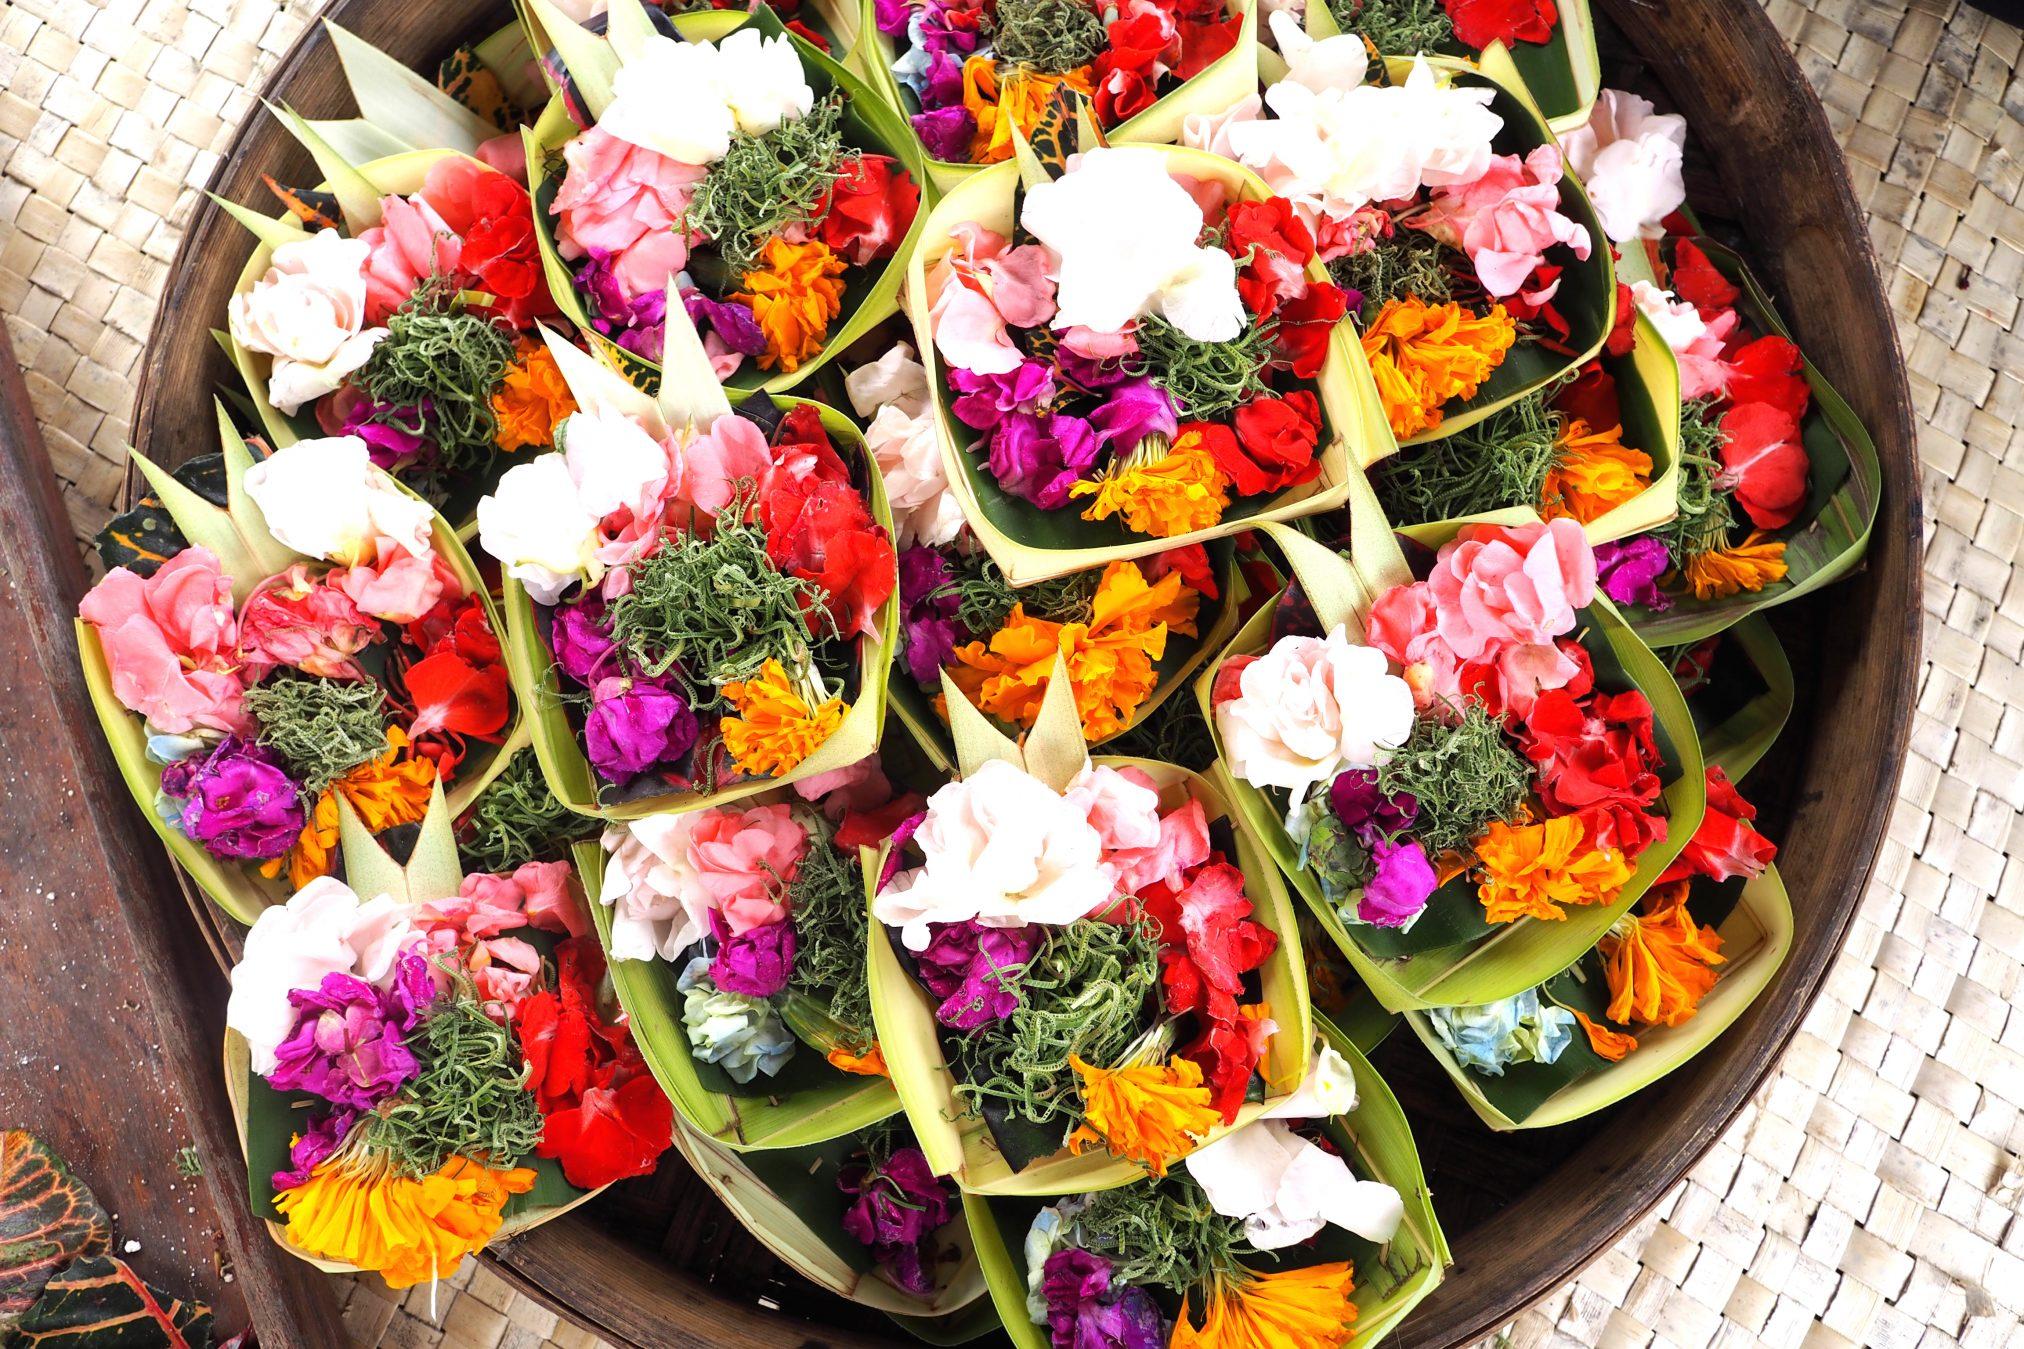 Rice Fields, Cooking Class in Bali and Uluwatu Temple